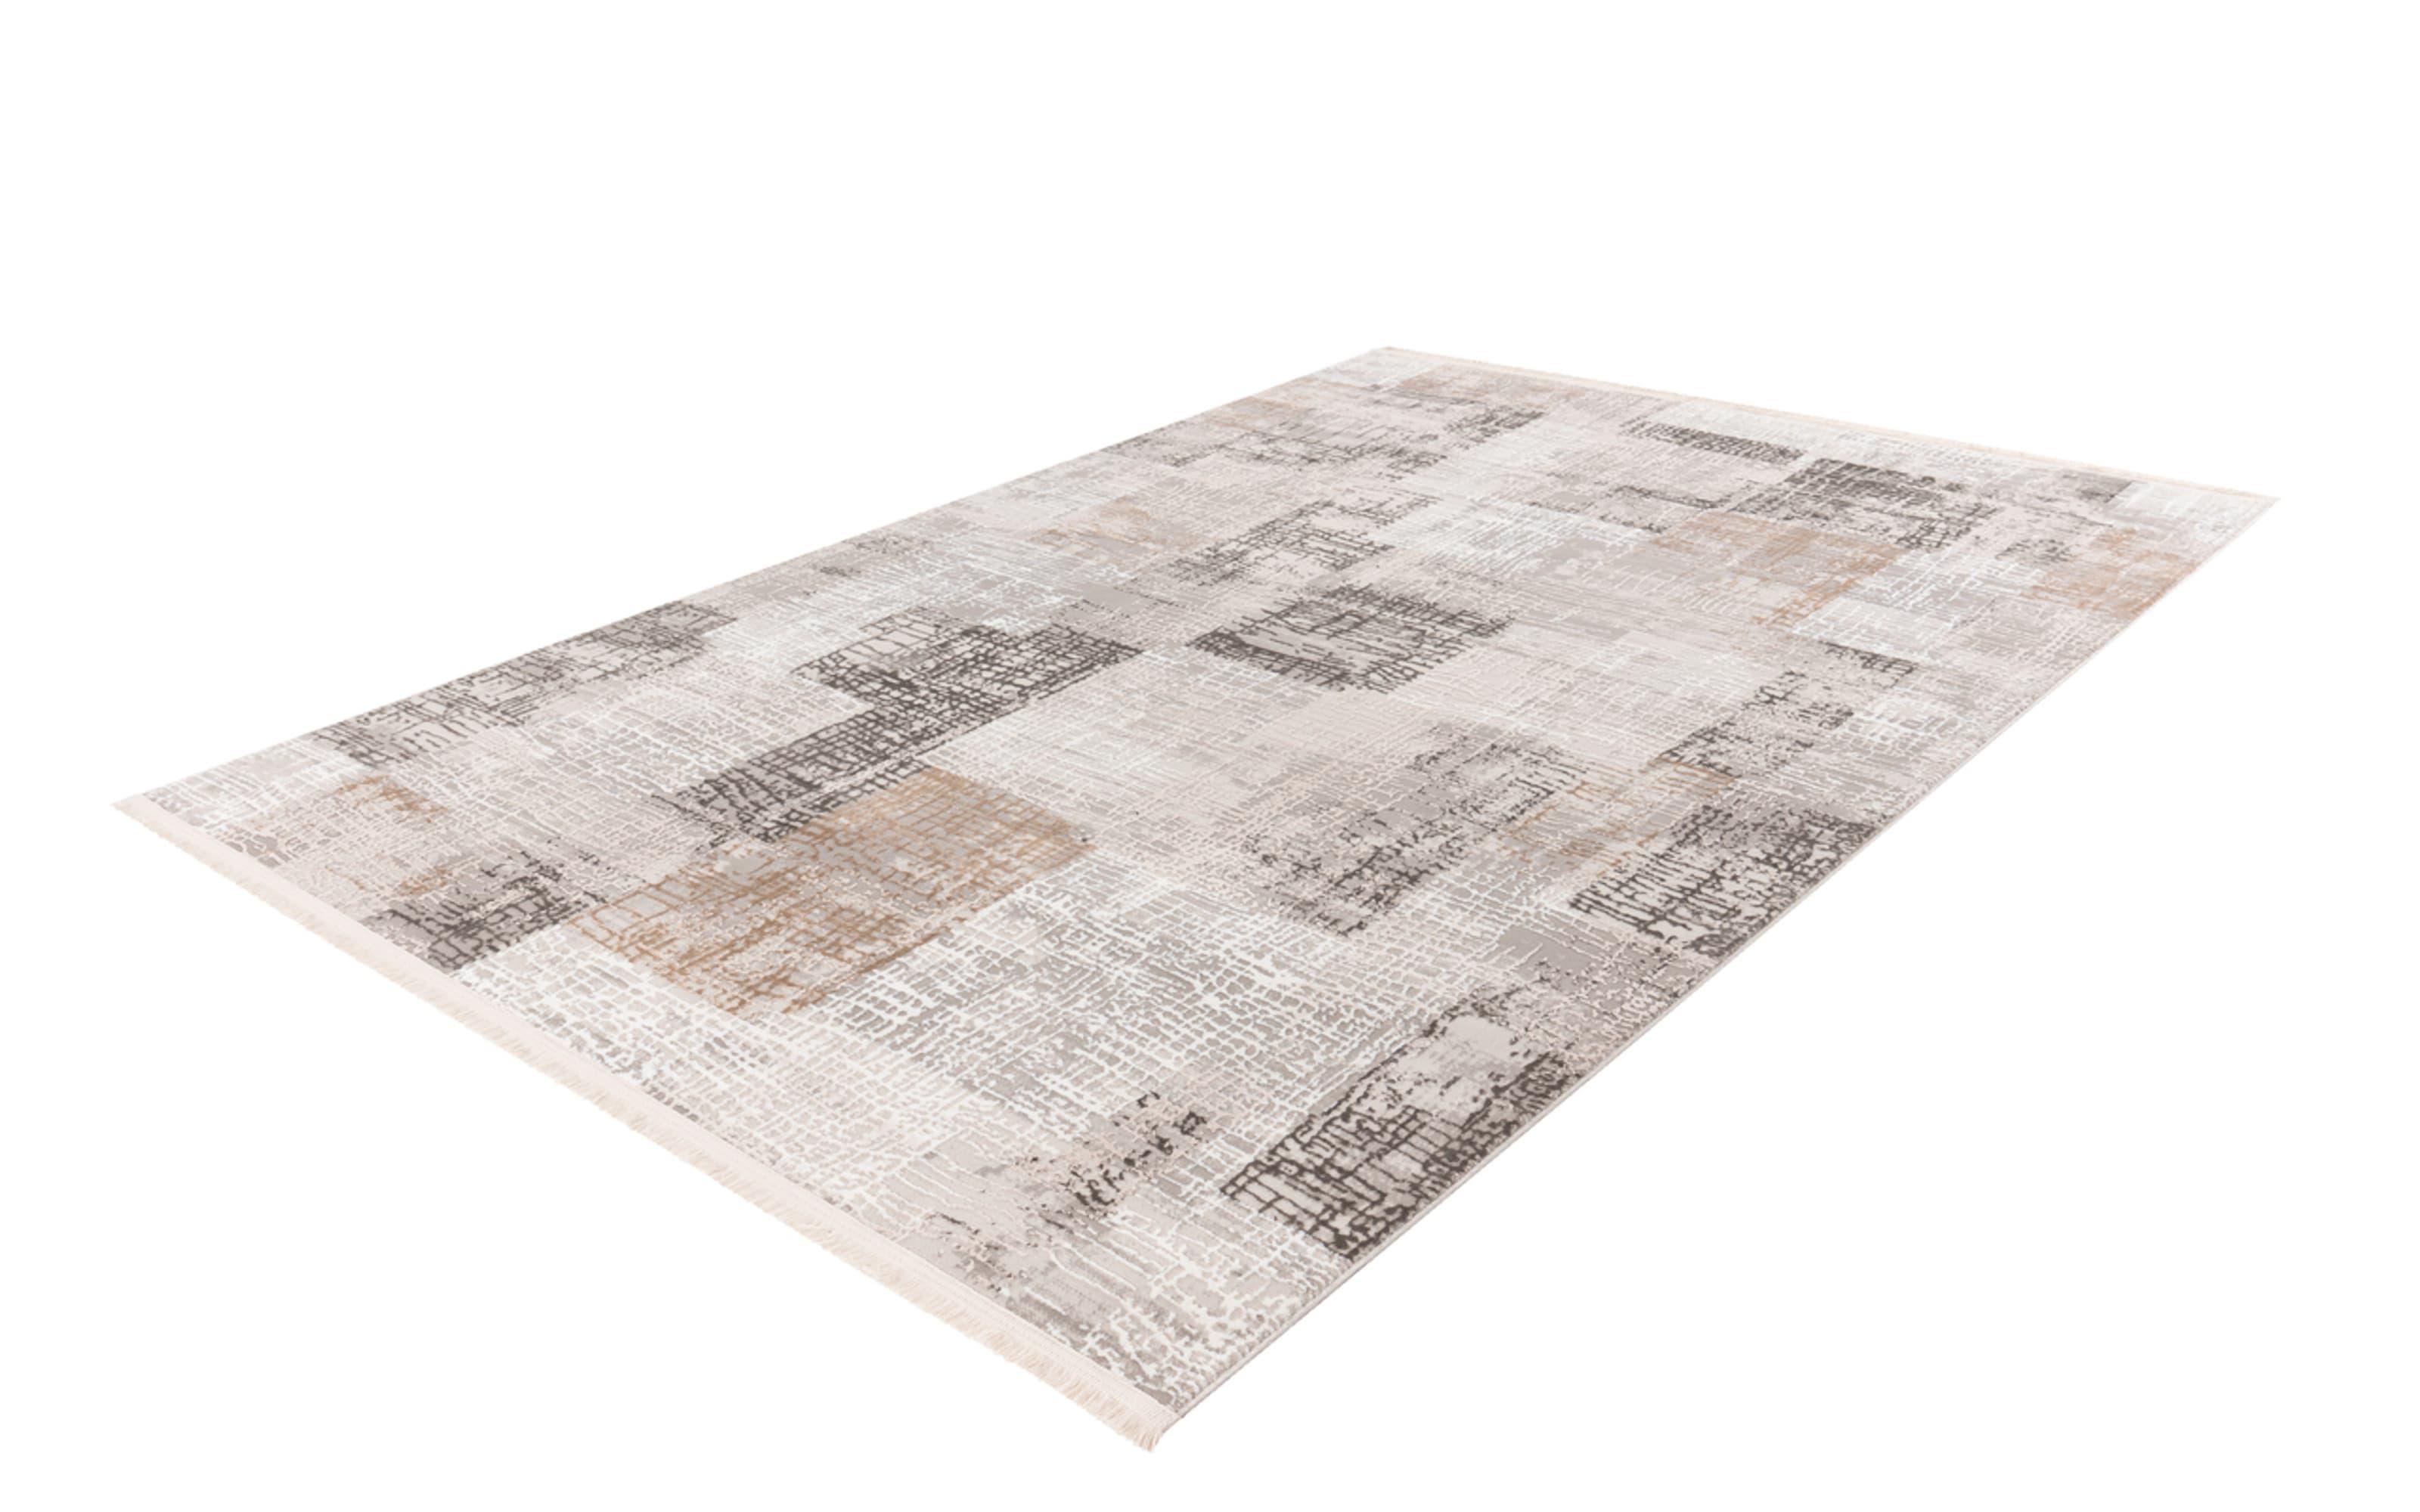 Teppich Akropolis 425 in grau-silber, ca. 120 x 180 cm